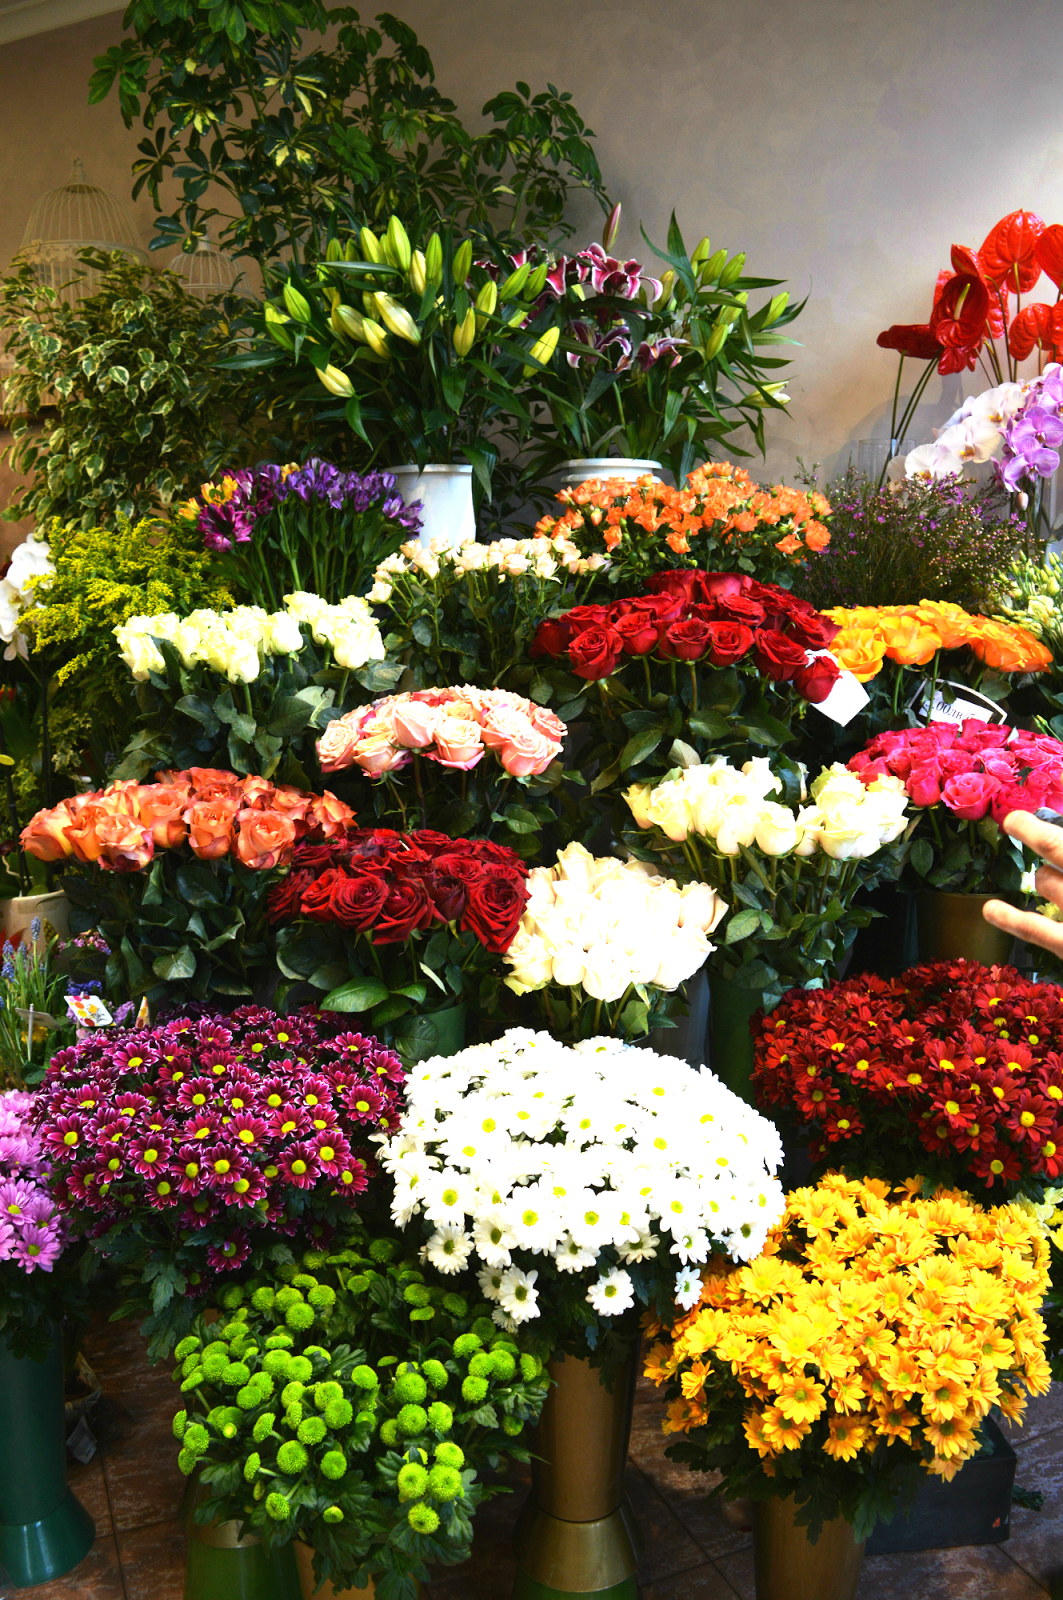 Flower shop in Sofia, Bulgaria